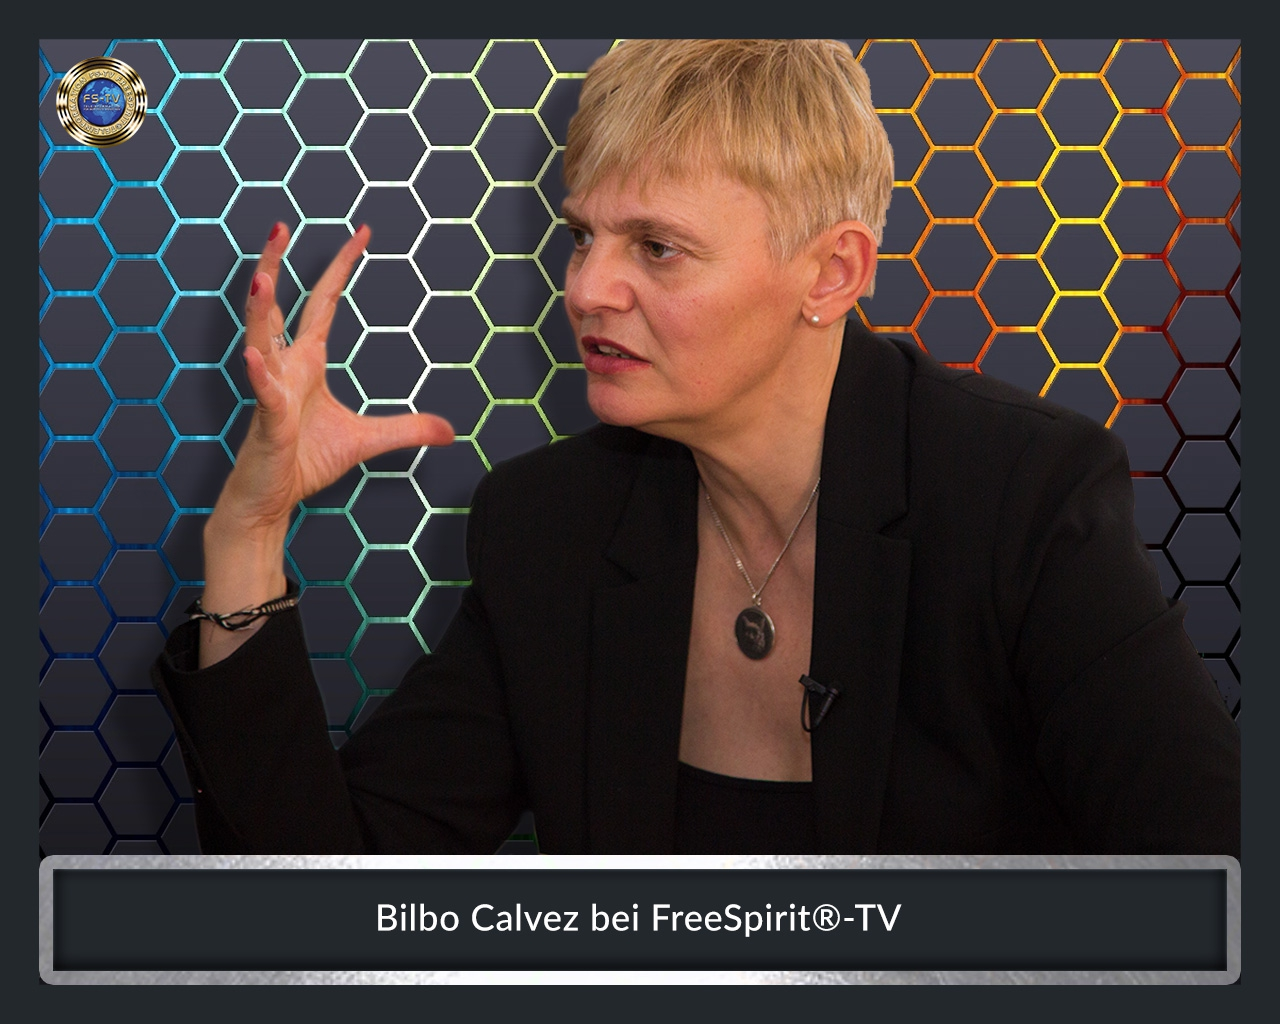 FS-TV-Bildergallerie-Bilbo-Calvez